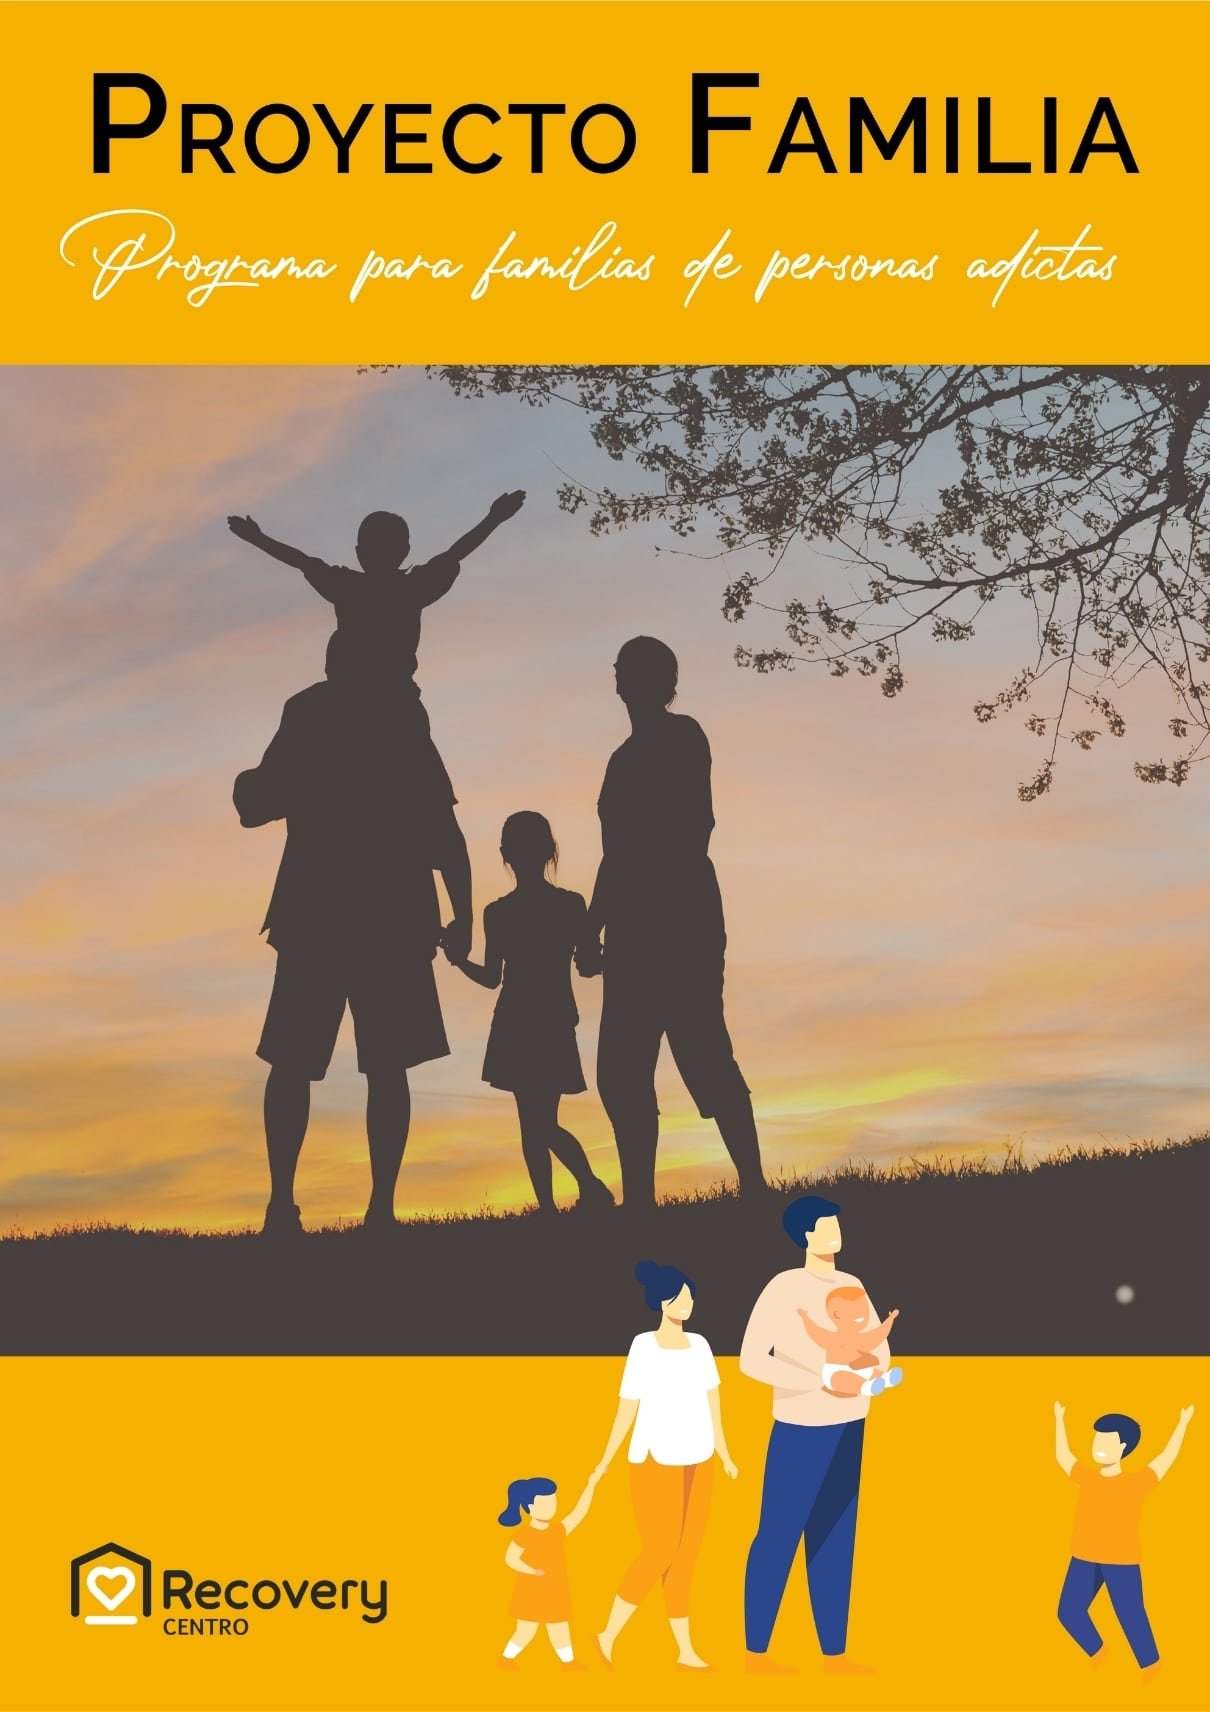 Proyecto ayuda familia Recovery Centro